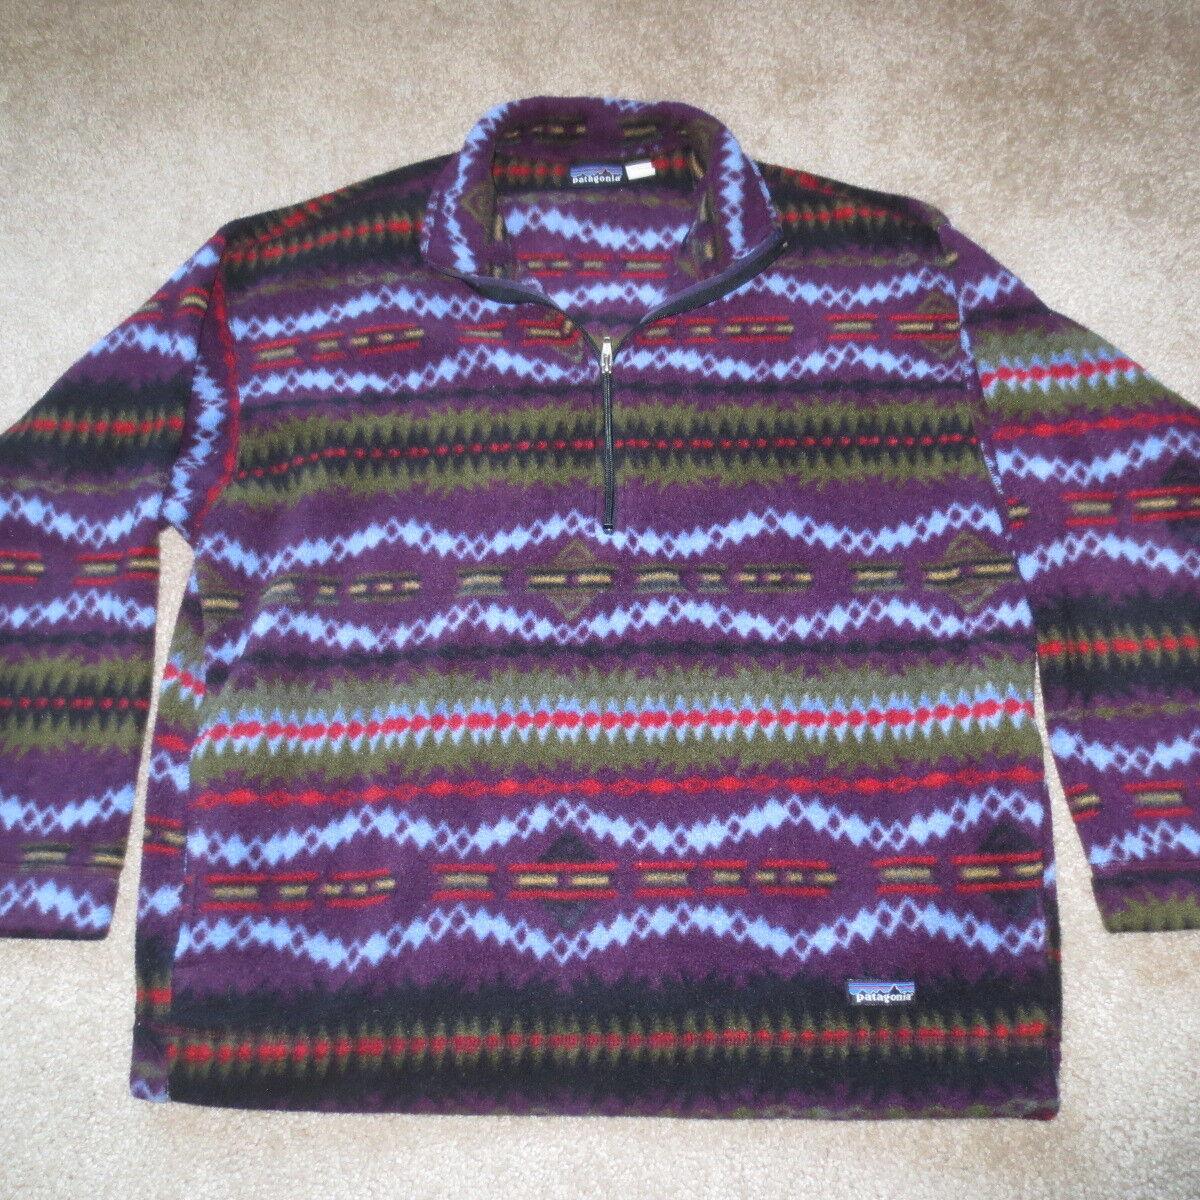 Erock s Vintage Clothing